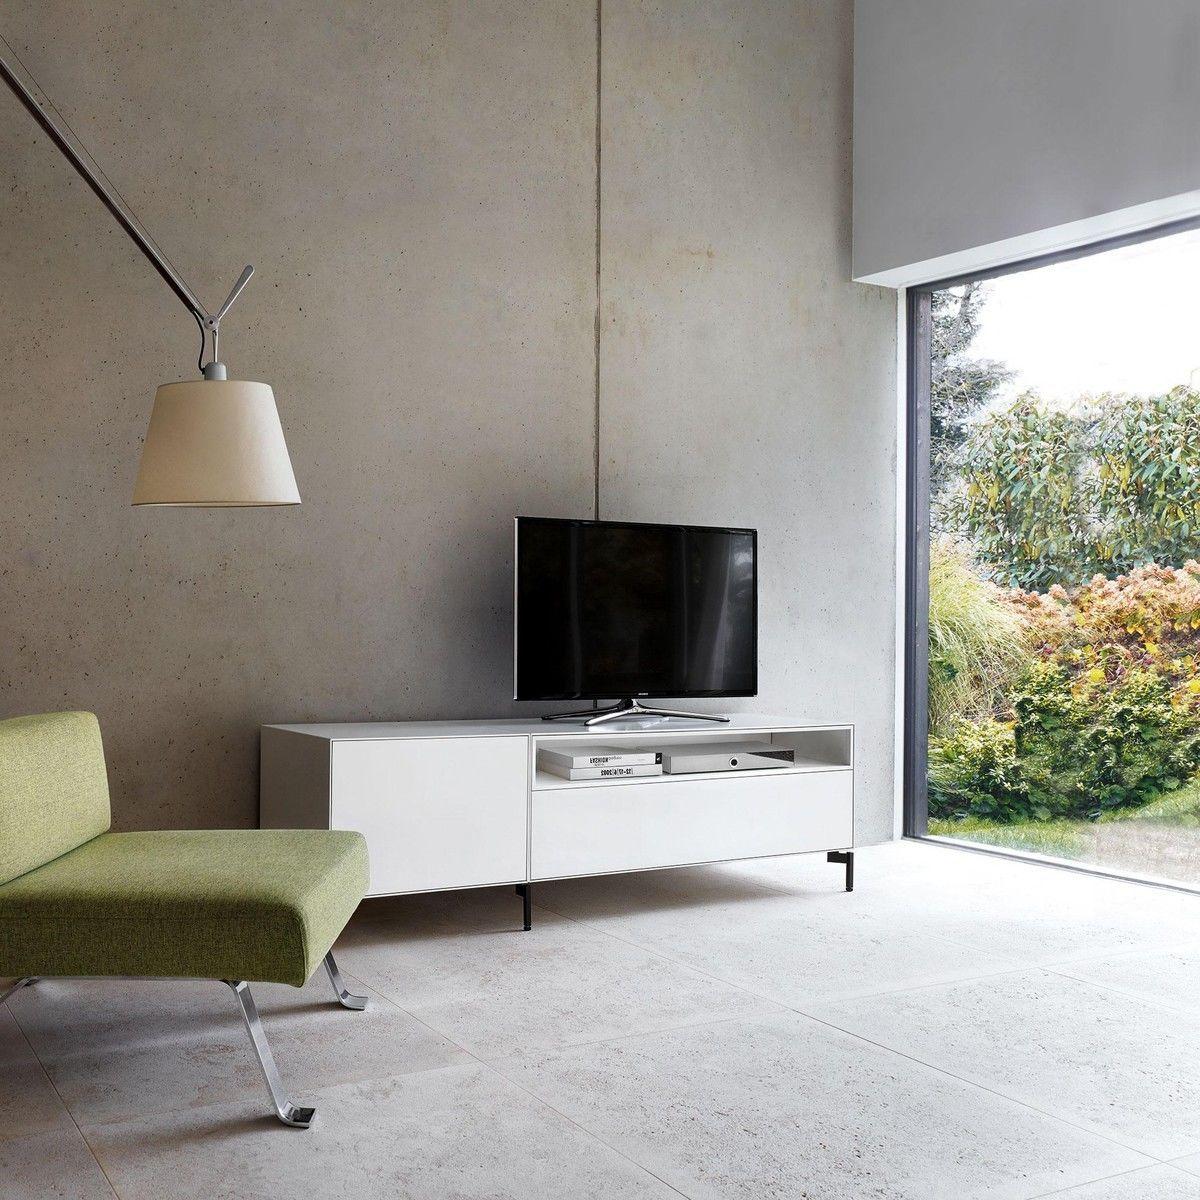 Nex Pur Box Tv Board 180×50 5x48cm Piure Ambientedirect Com # Meuble Tv Nesx